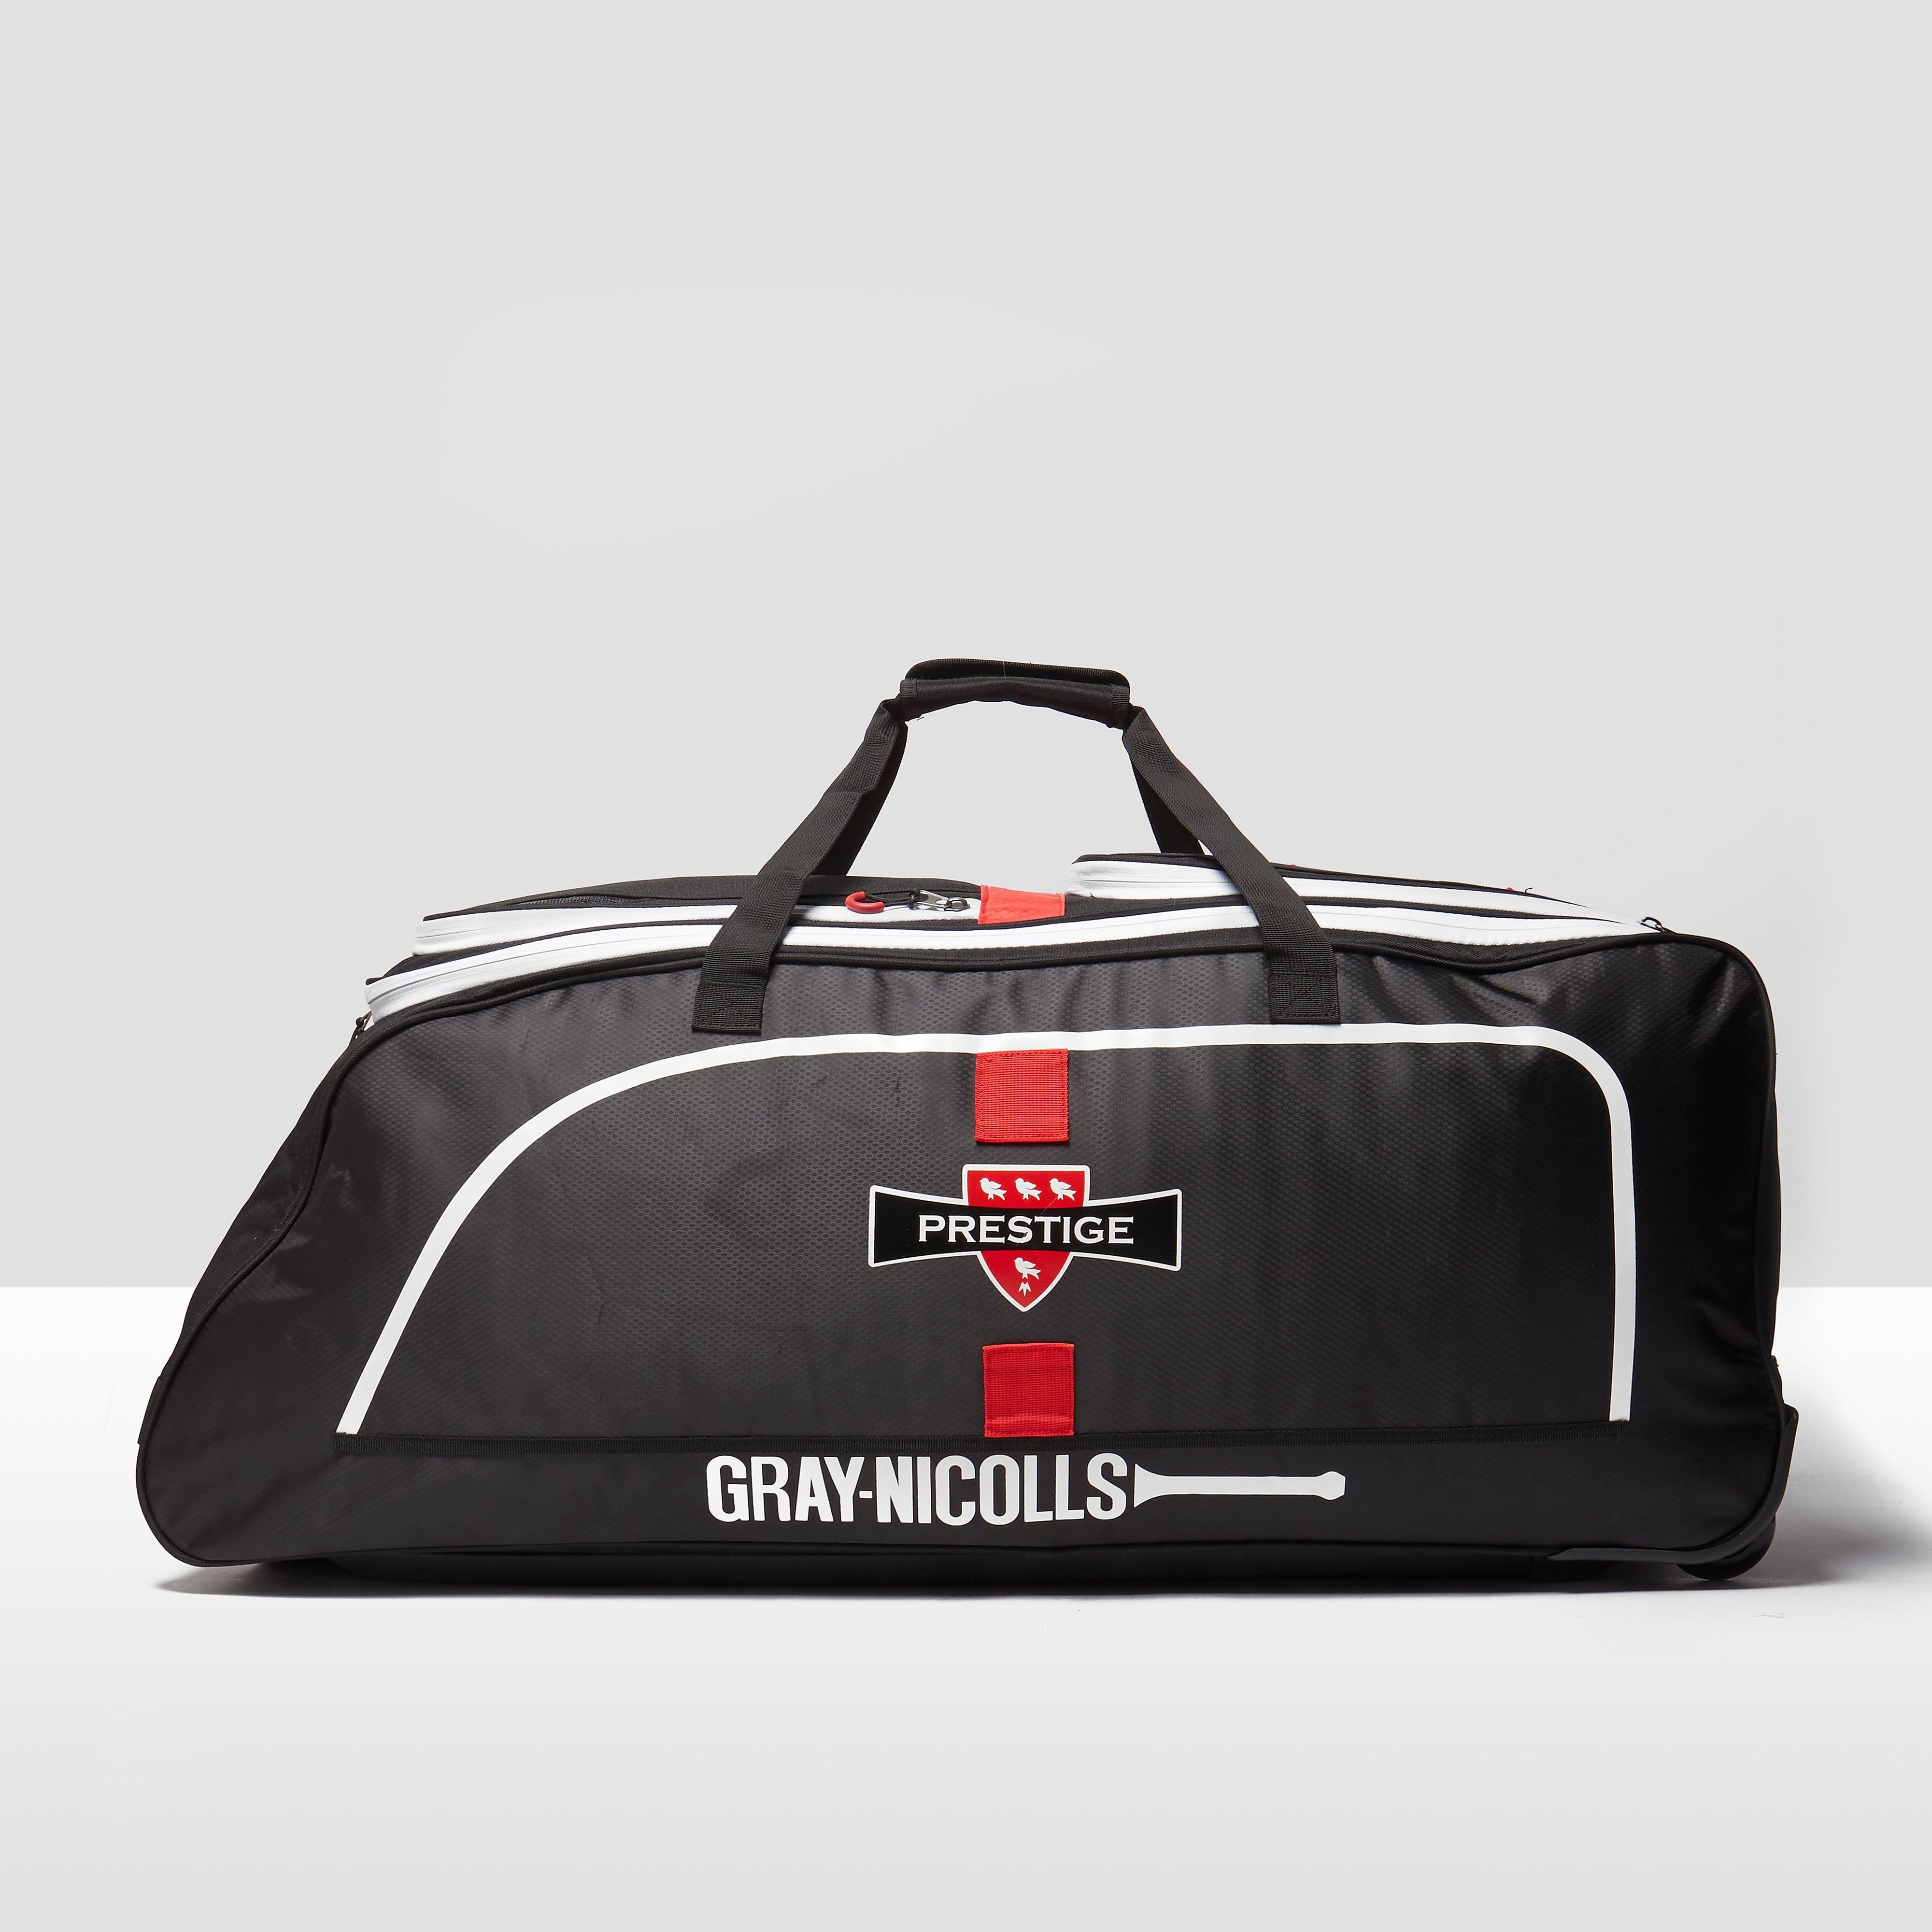 Gray Nicolls Prestige Luggage Cricket Kit Bag